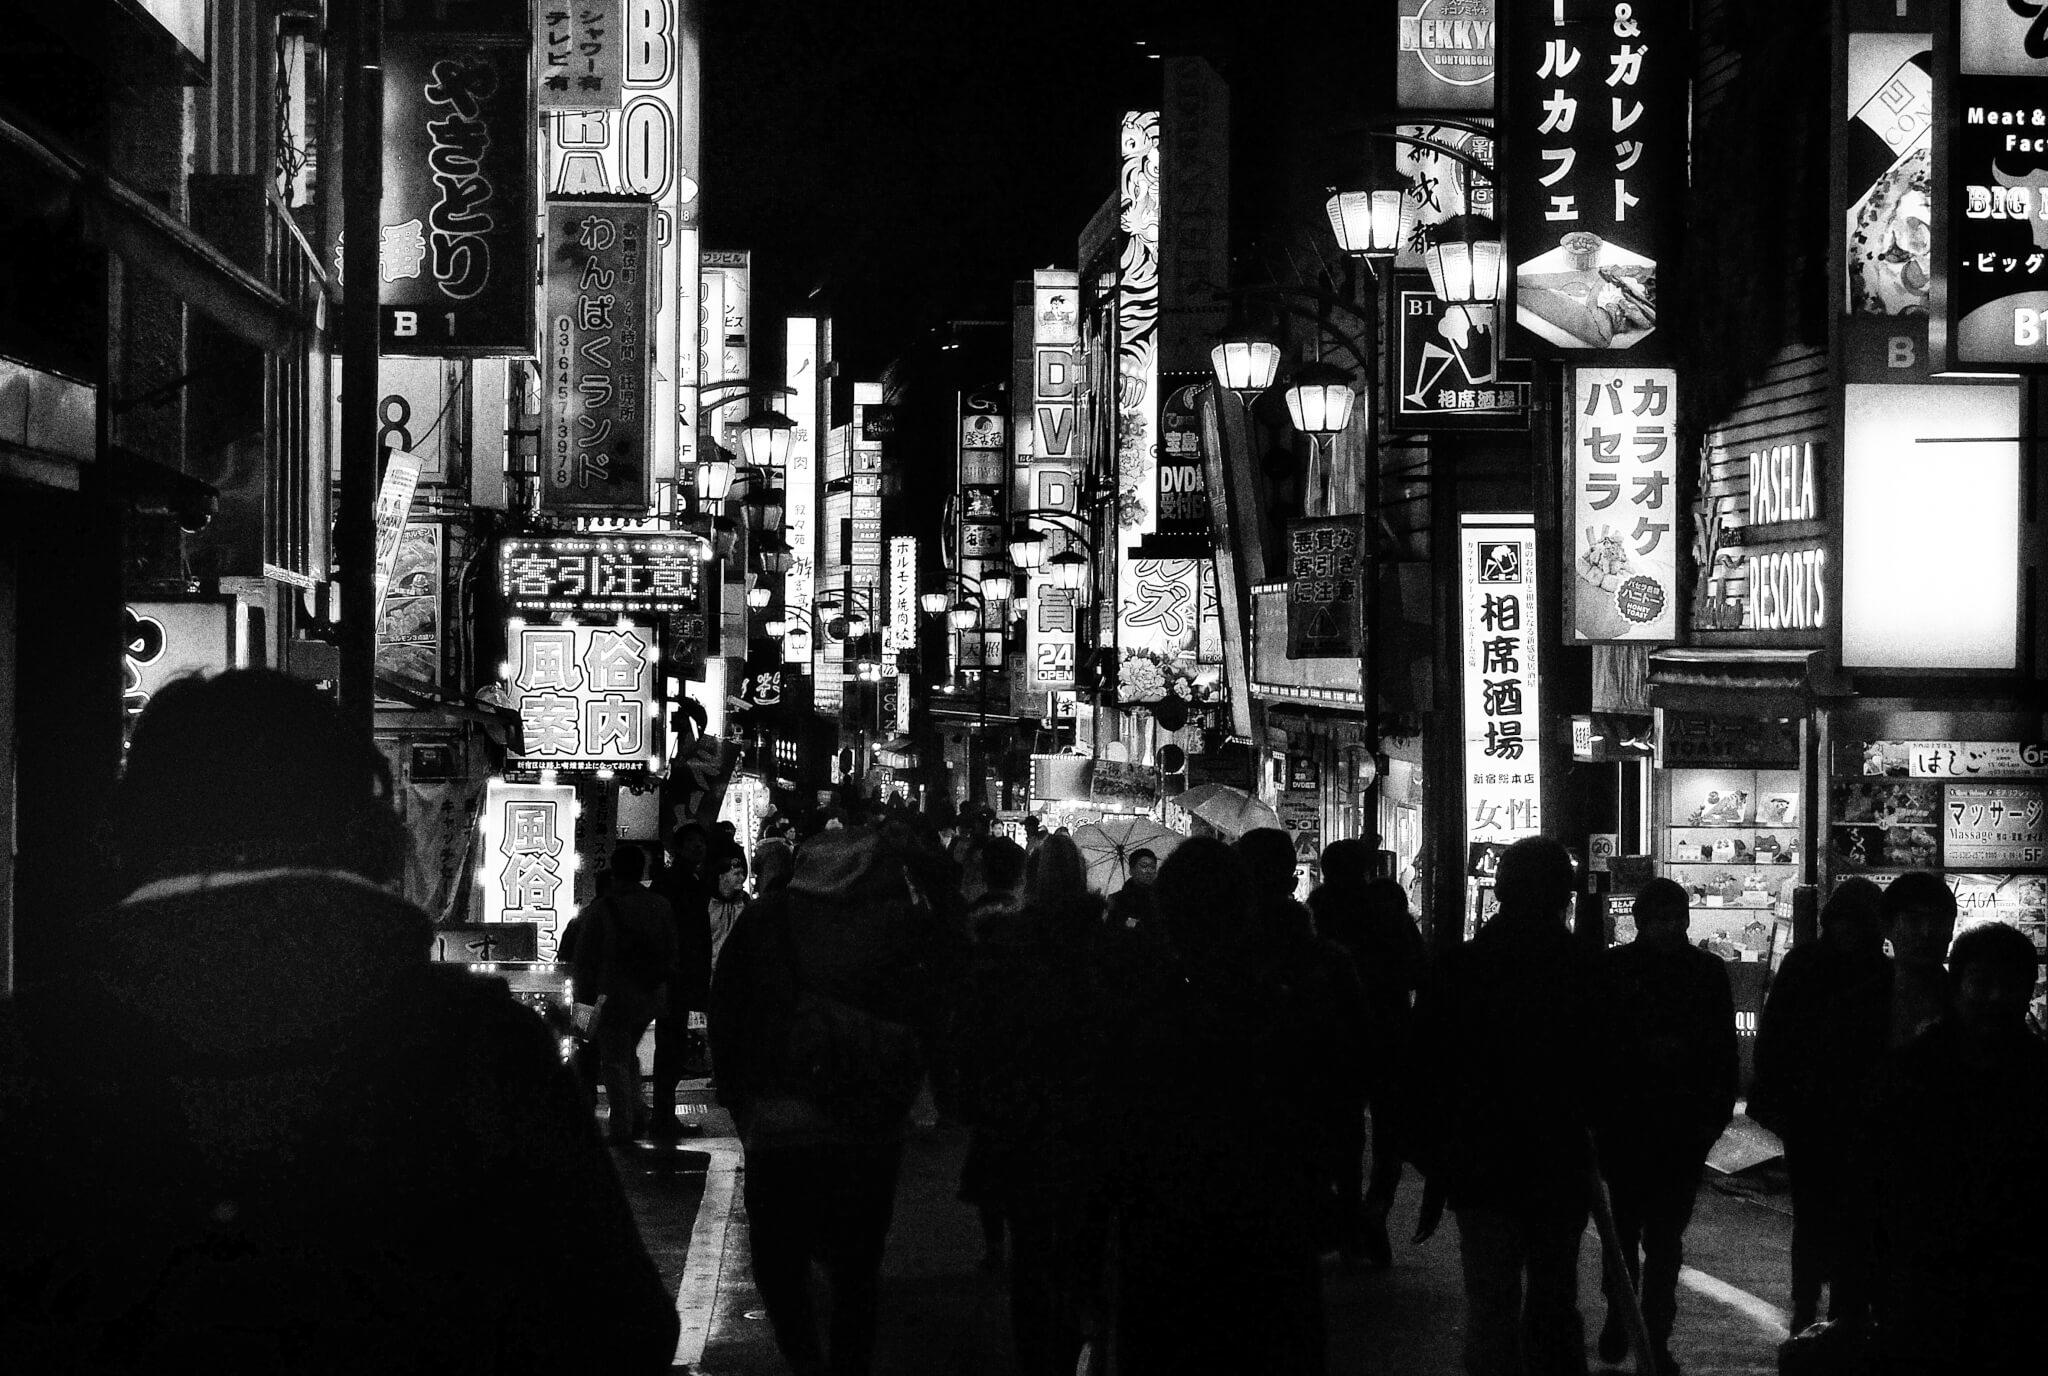 Daidō Moriyama, Streets of Japan